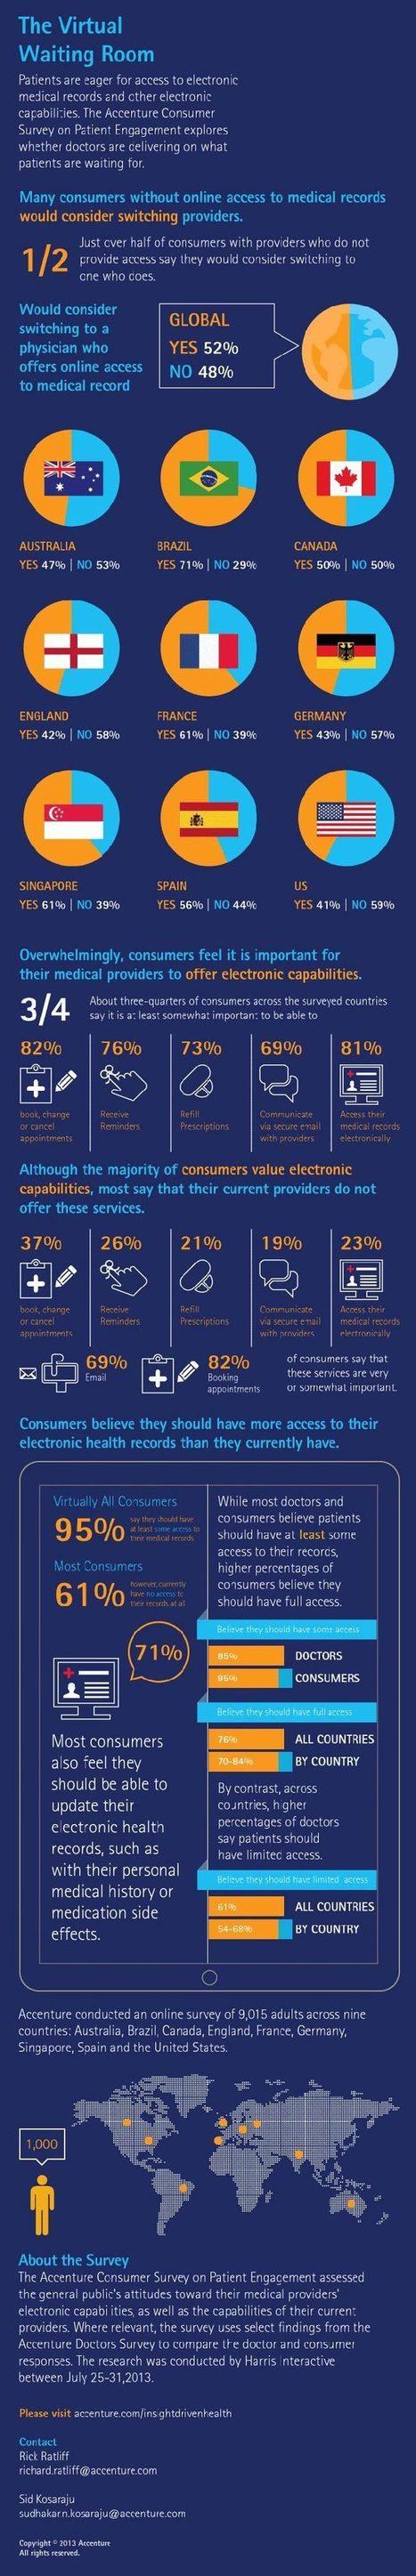 Accenture Consumer Survey on Patient Engagement - Infographic | Piero | Scoop.it